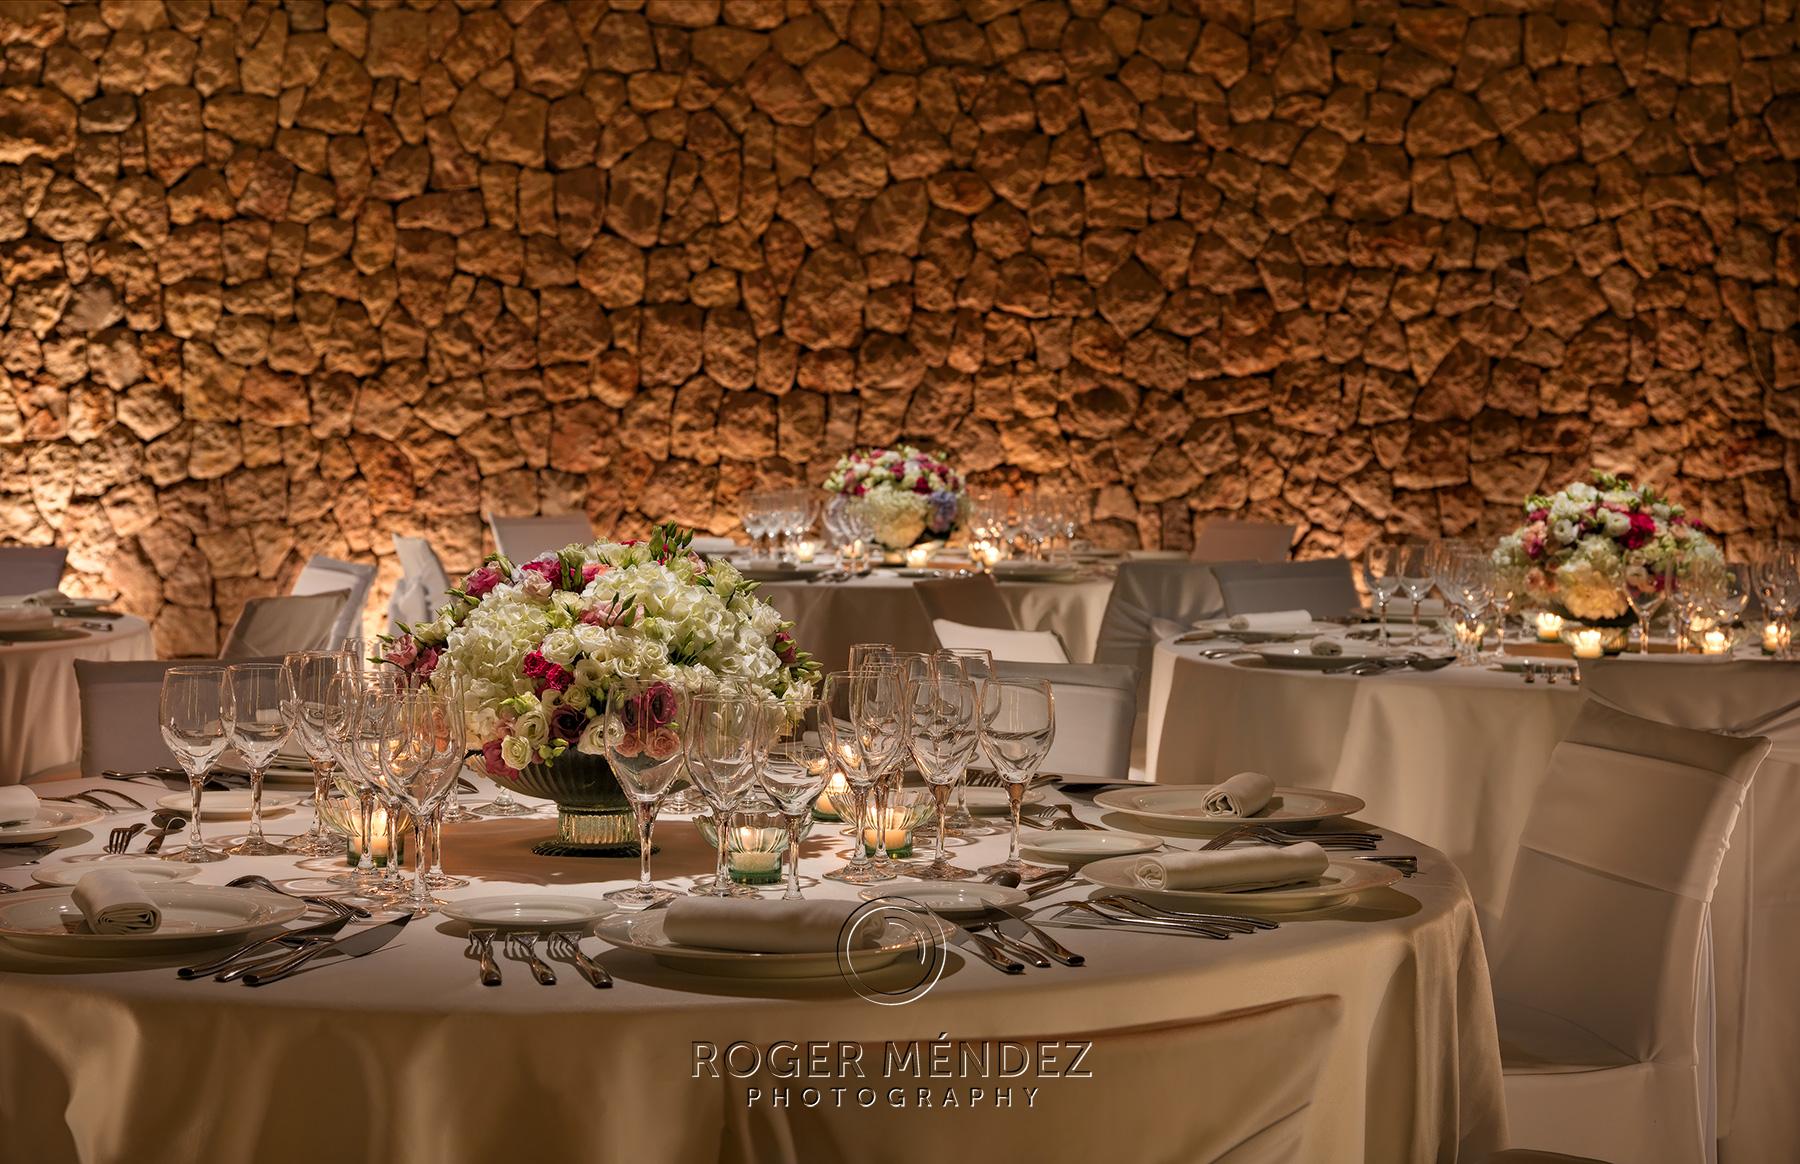 Banquet set up table detail